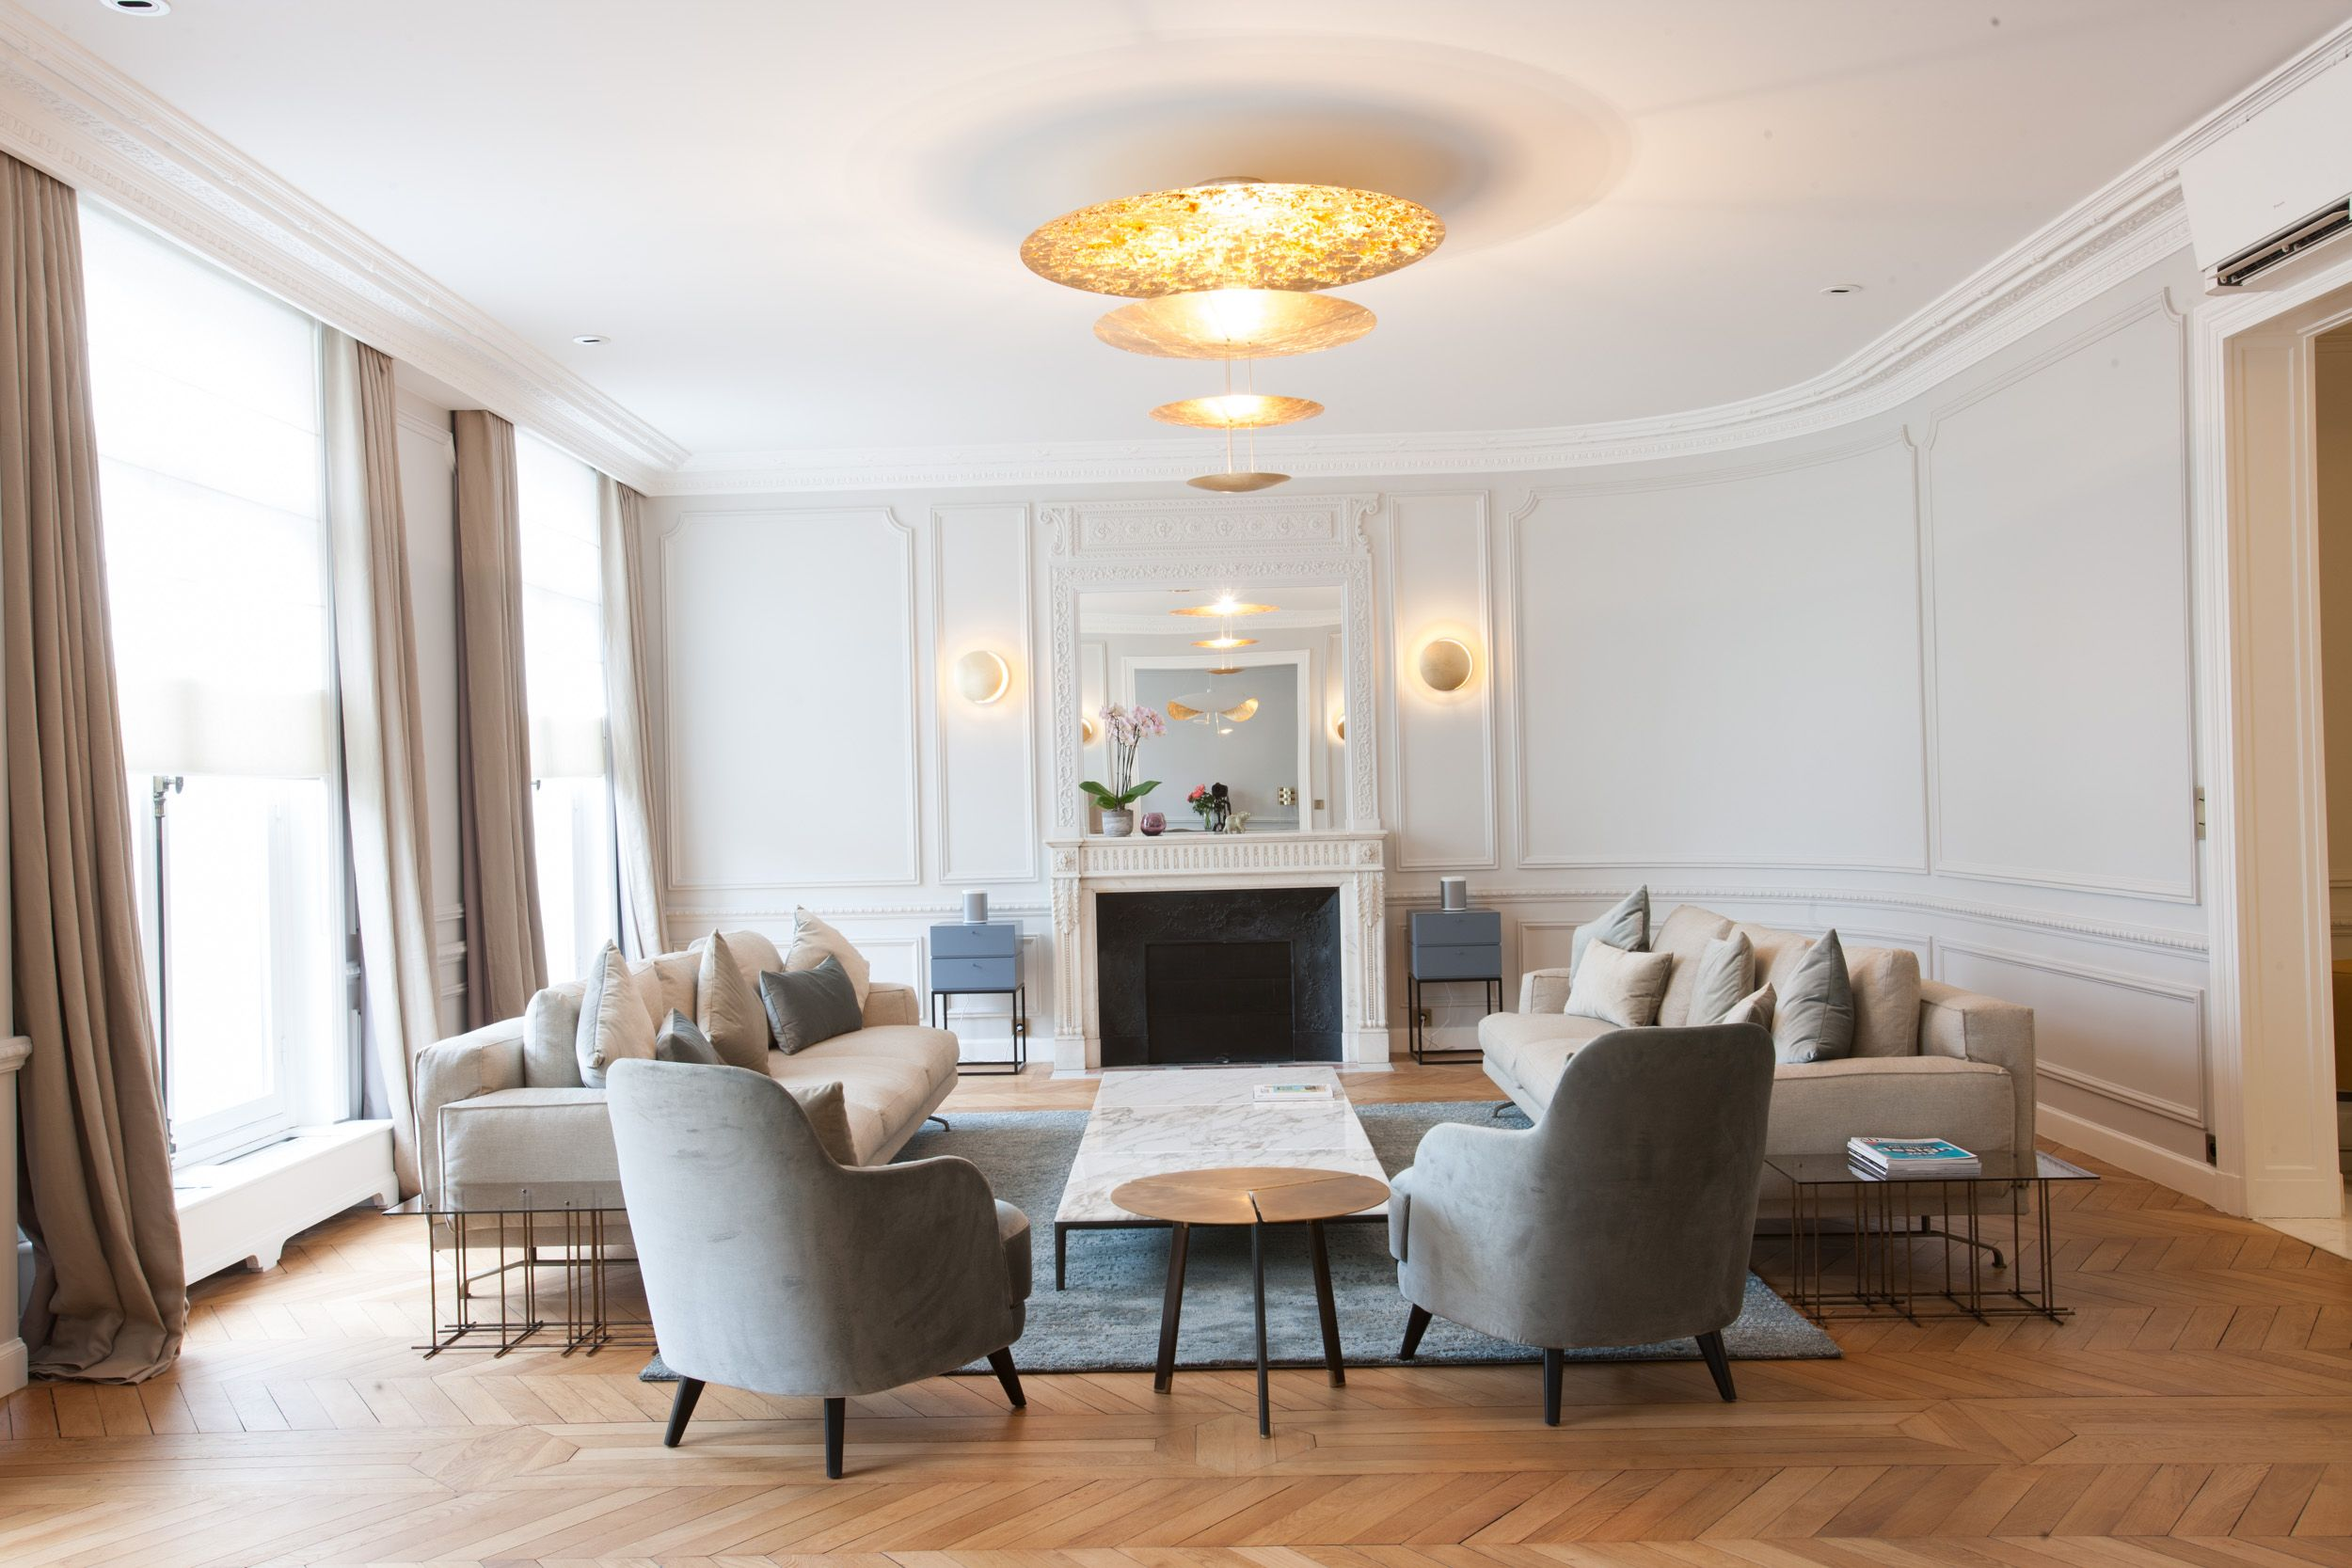 salon appartement haussmannien   REALISATIONS - PROJETS   Pinterest